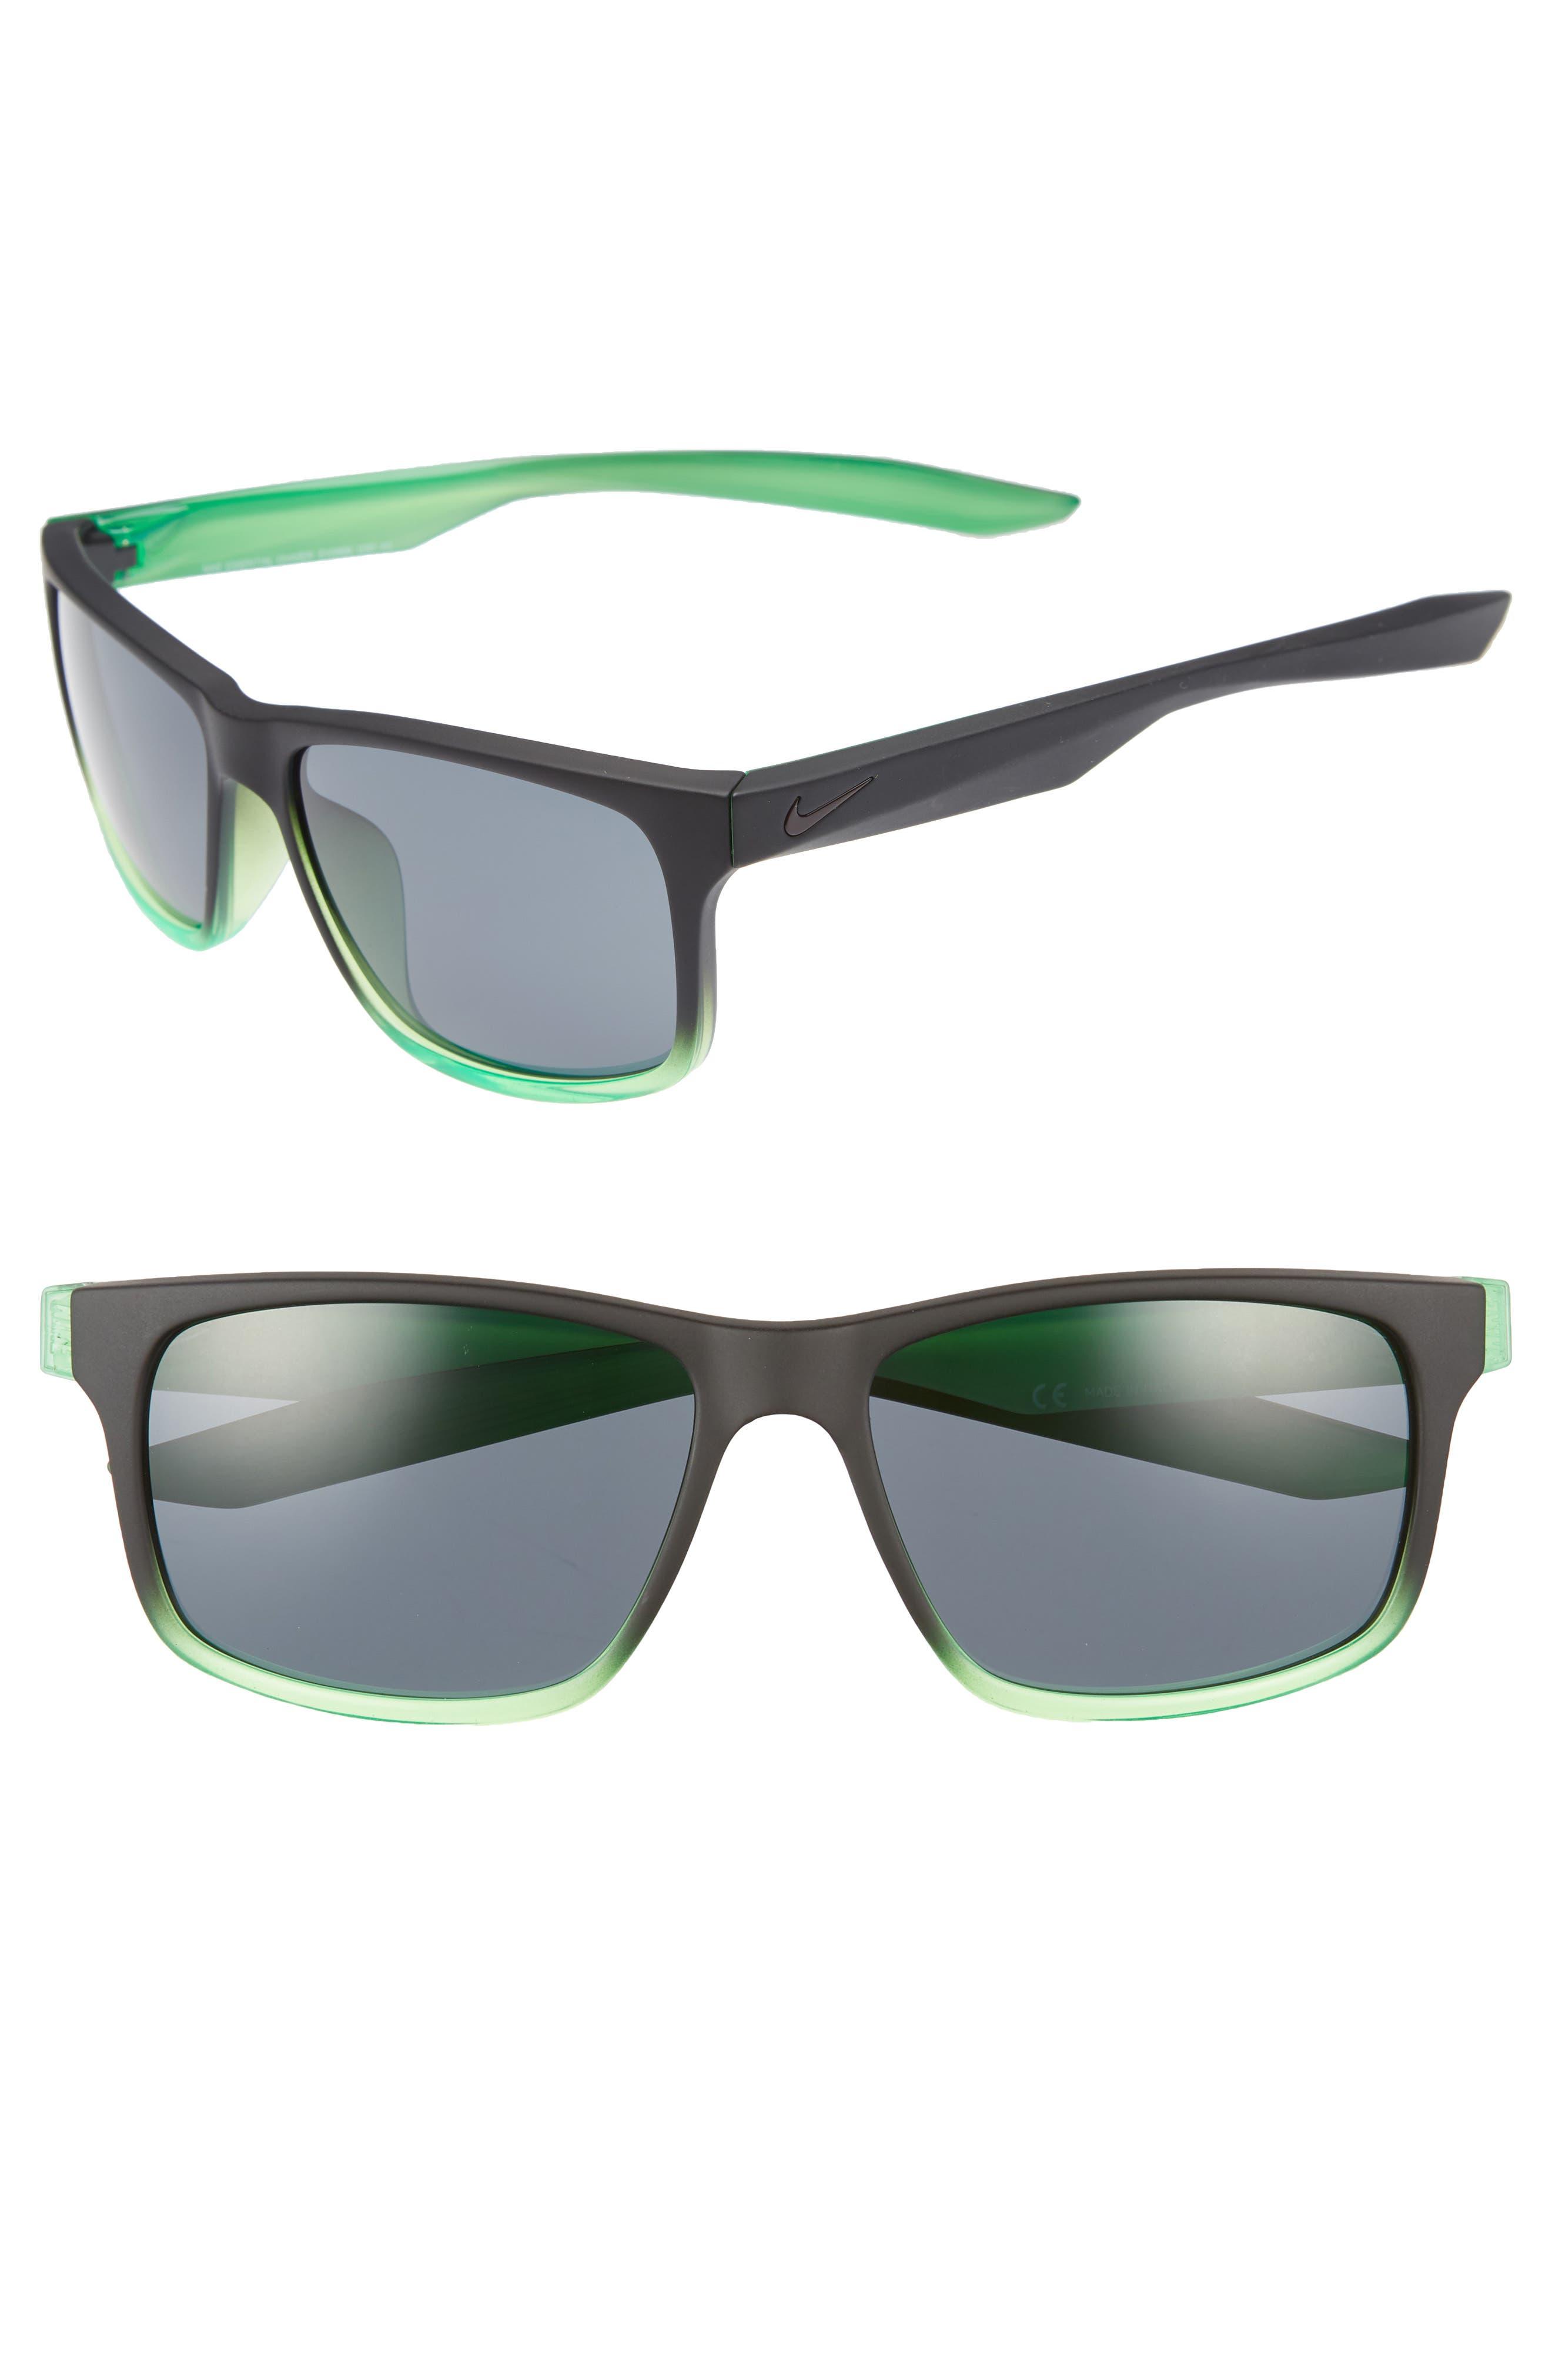 Nike Essential Chaser 5m Sunglasses - Matte Black Green/ Dark Grey